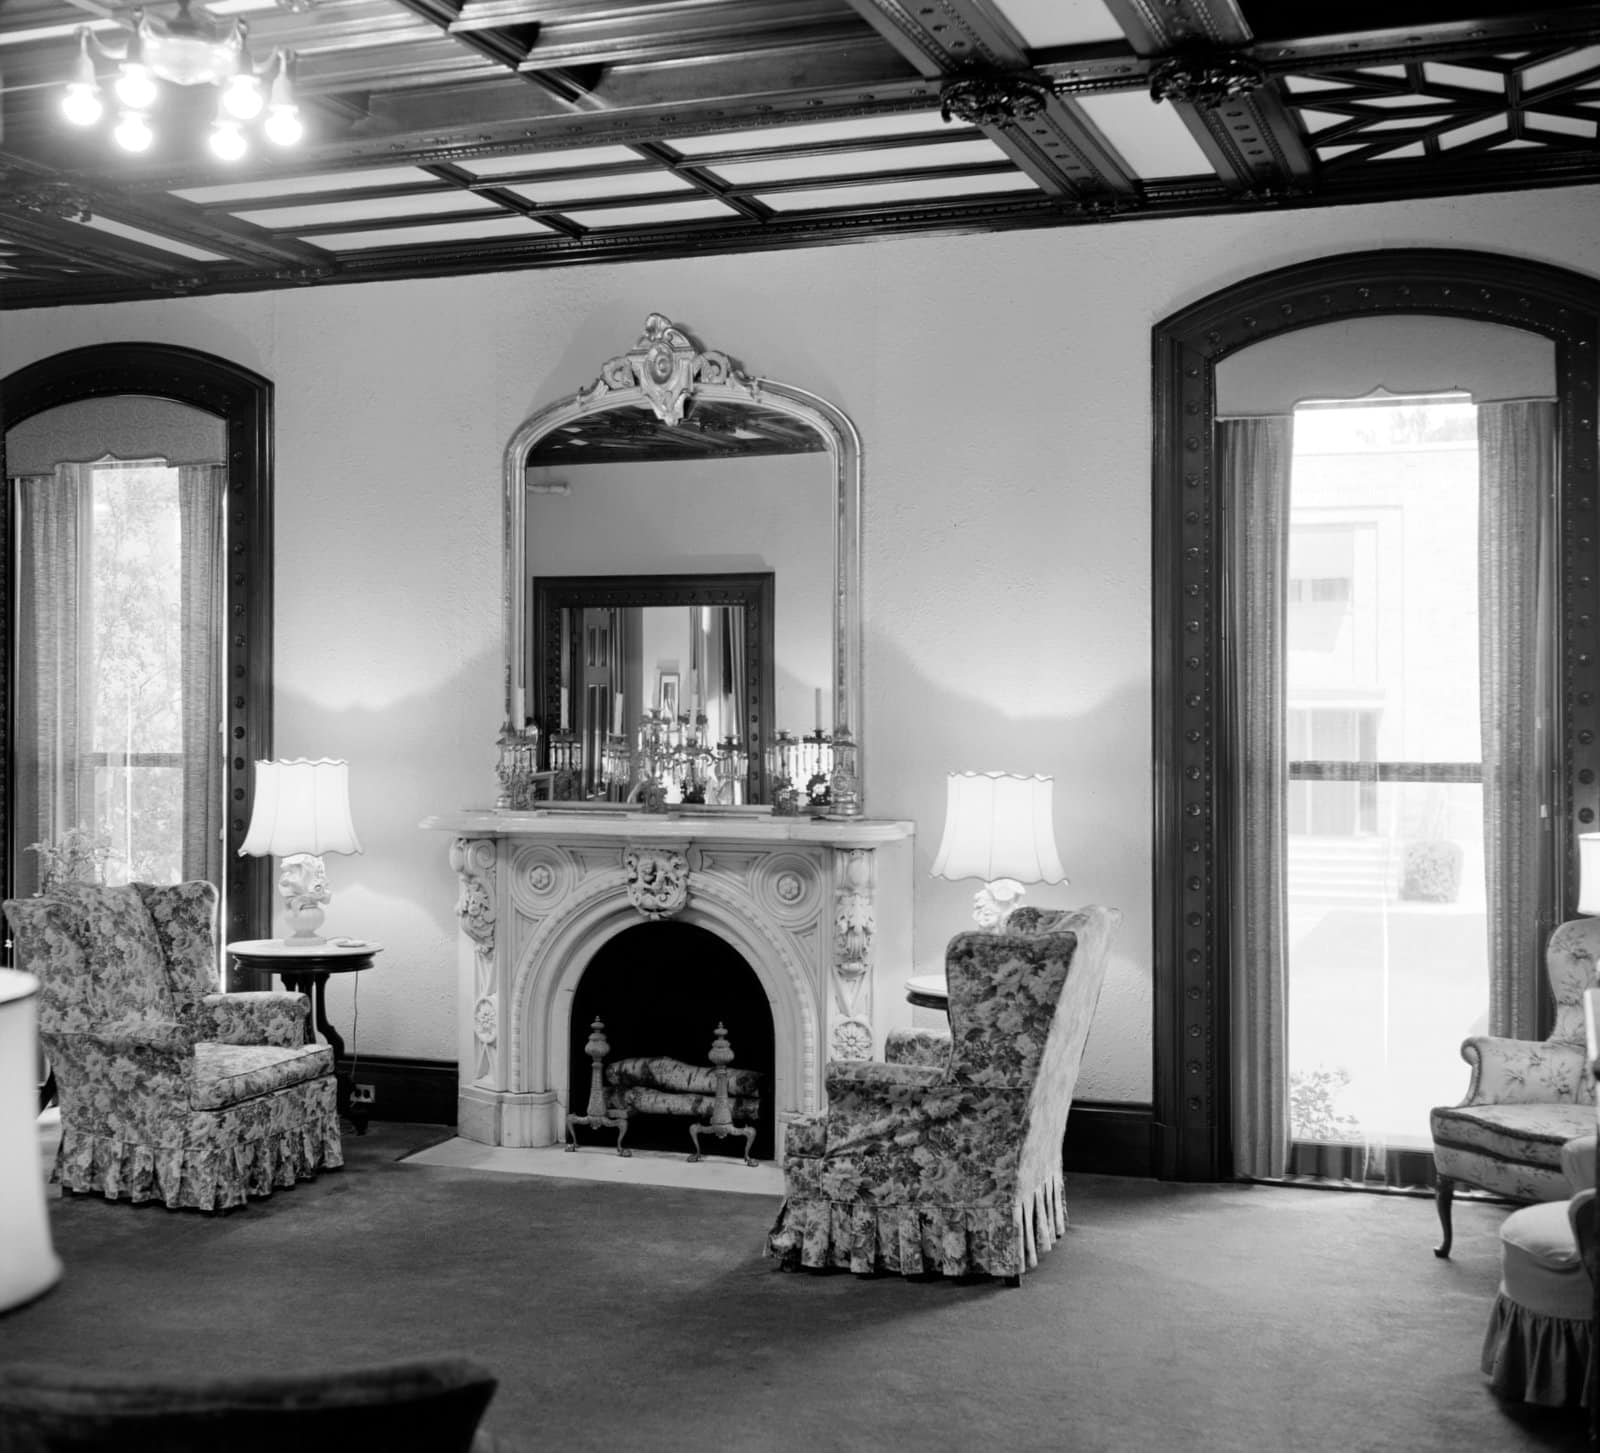 Inside Armsmear - Samuel Colt's old home in Hartford, Connecticut